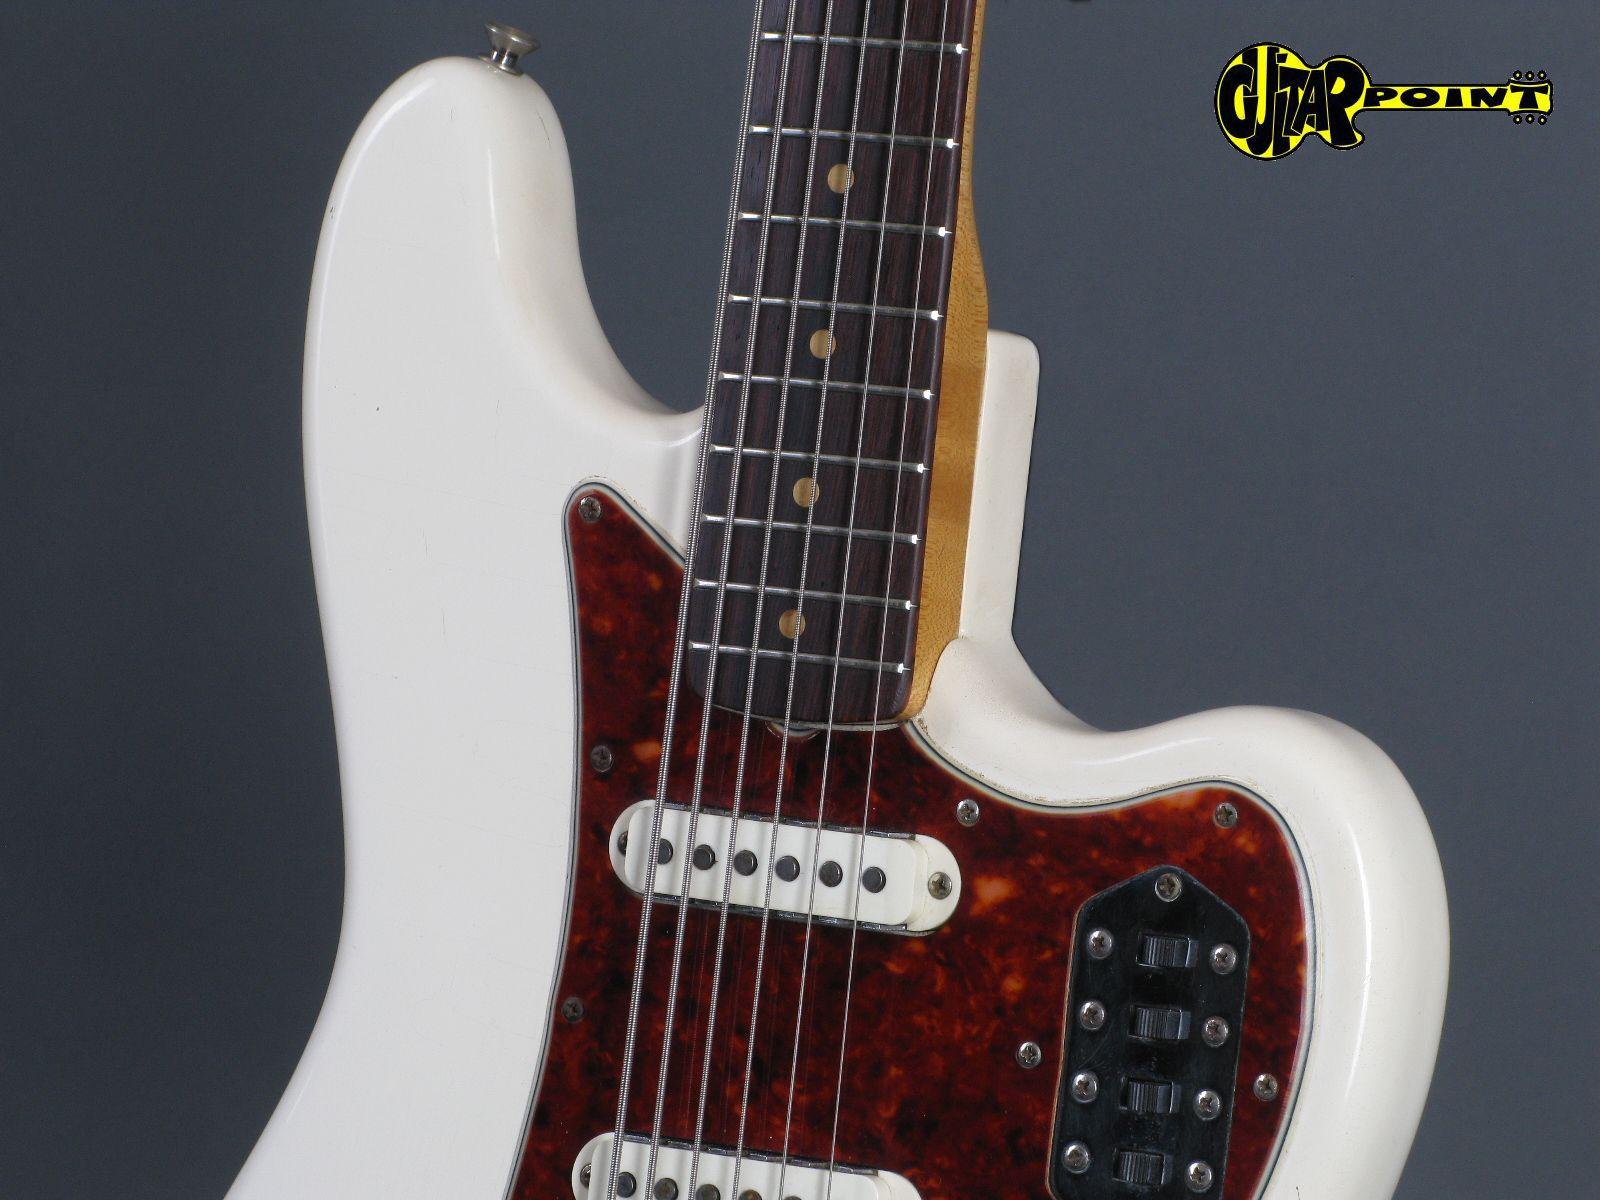 fender bass vi 1963 olympic white guitar for sale guitarpoint. Black Bedroom Furniture Sets. Home Design Ideas